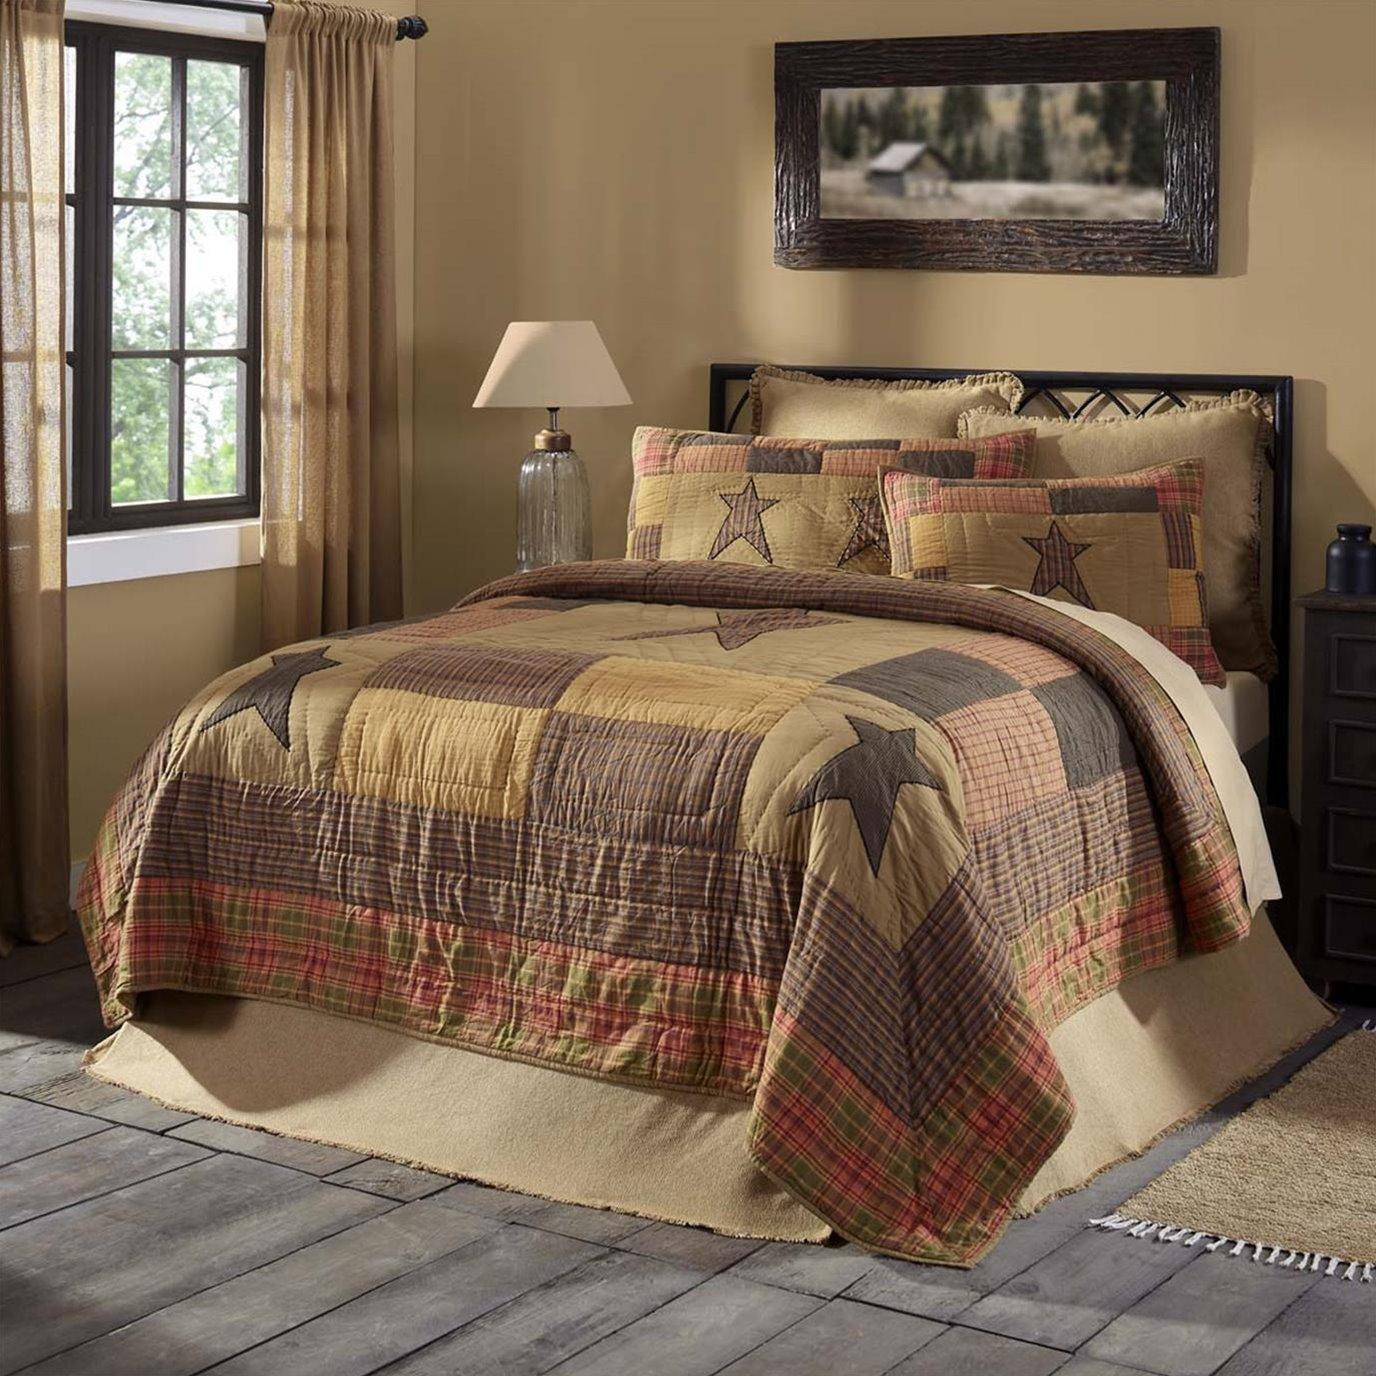 Stratton Luxury King Quilt 120Wx105L